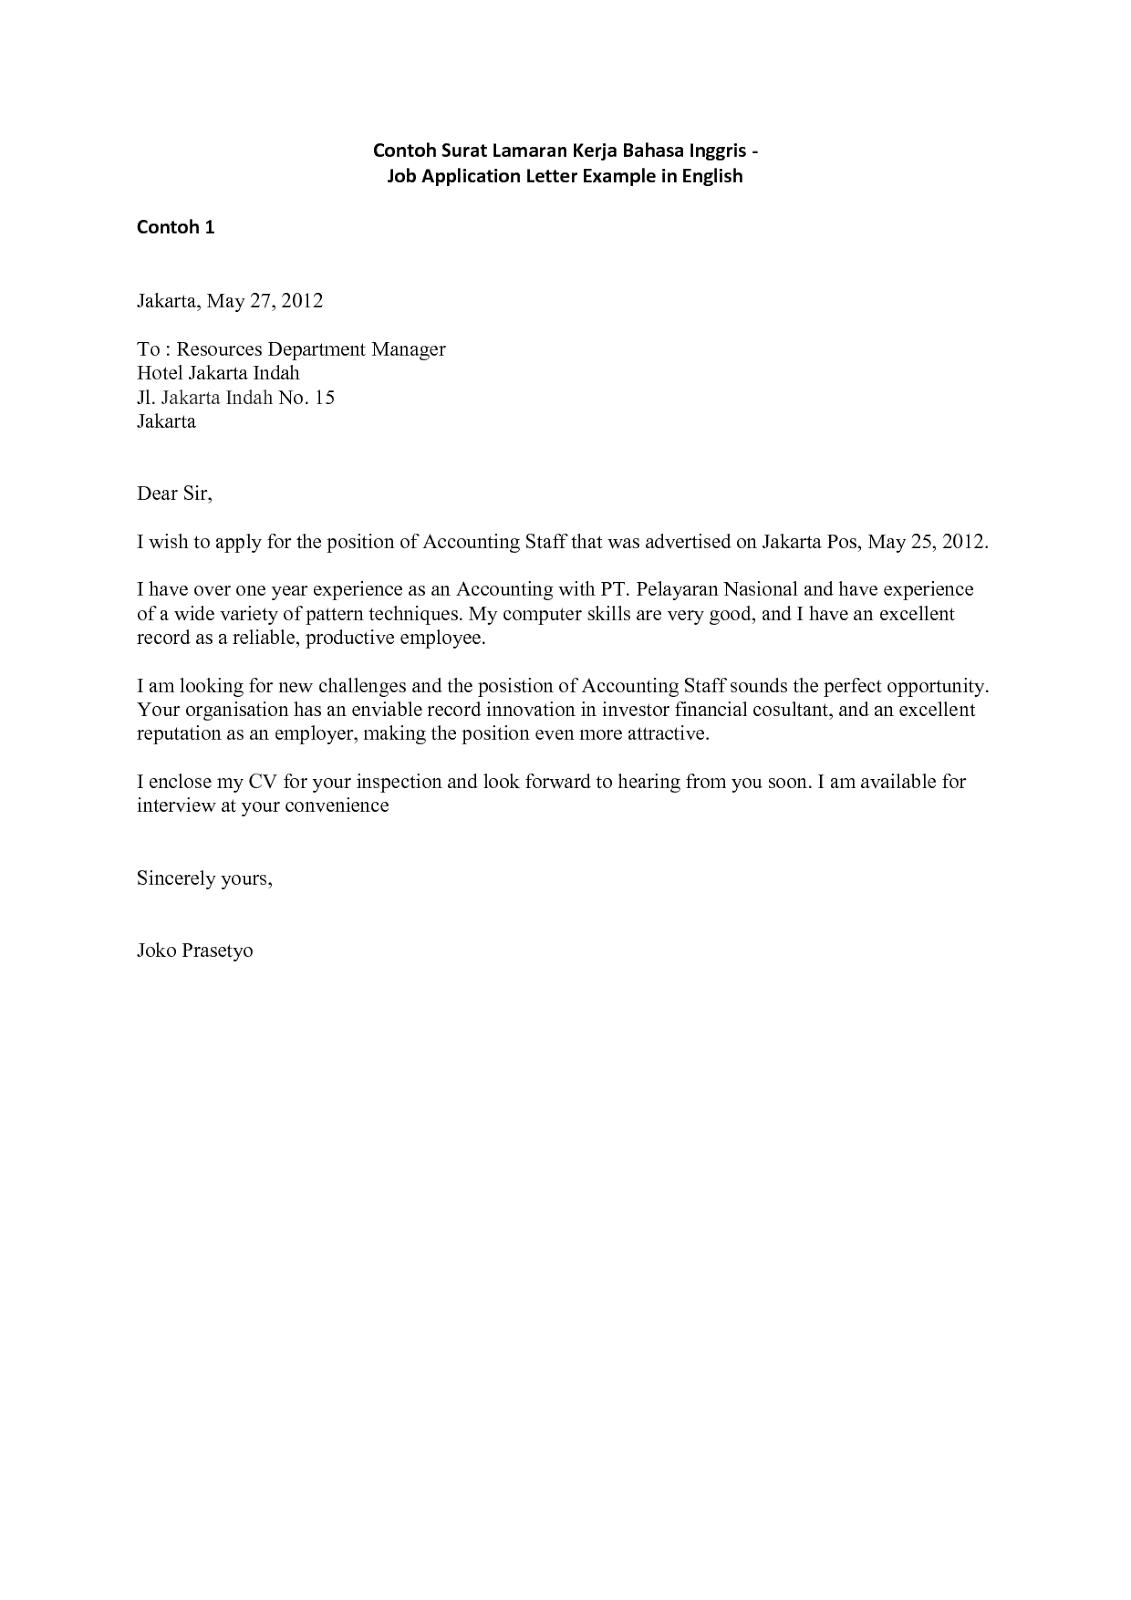 Surat Lamaran Kerja Bahasa Inggris Assistant Manager Bahasa Inggris Bahasa Inggris